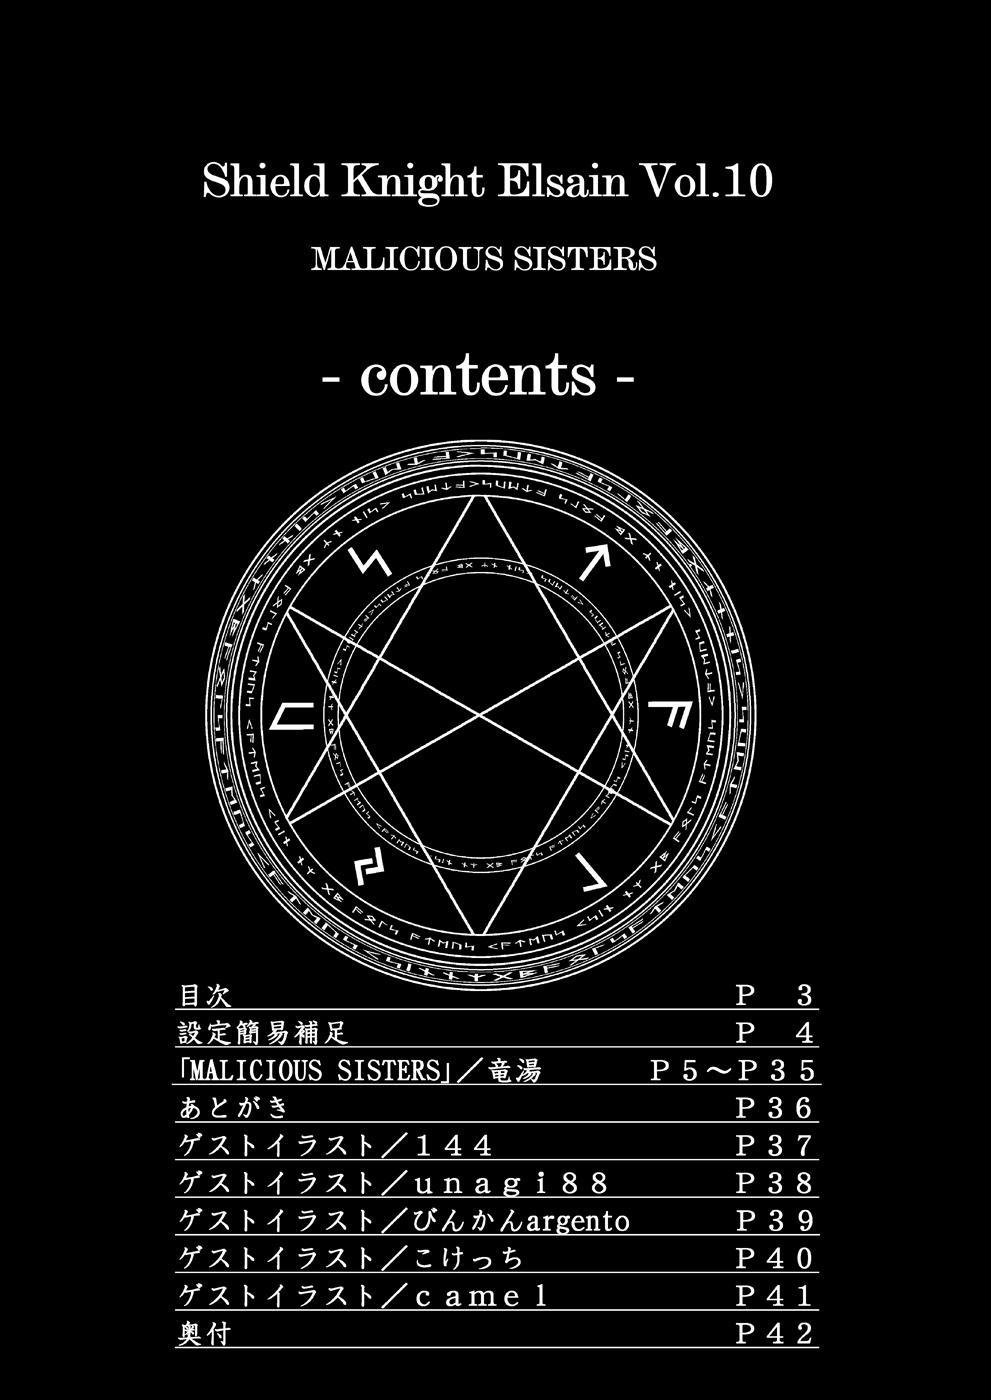 Shield Knight Elsain Vol.10 MALICIOUS SISTERS 1